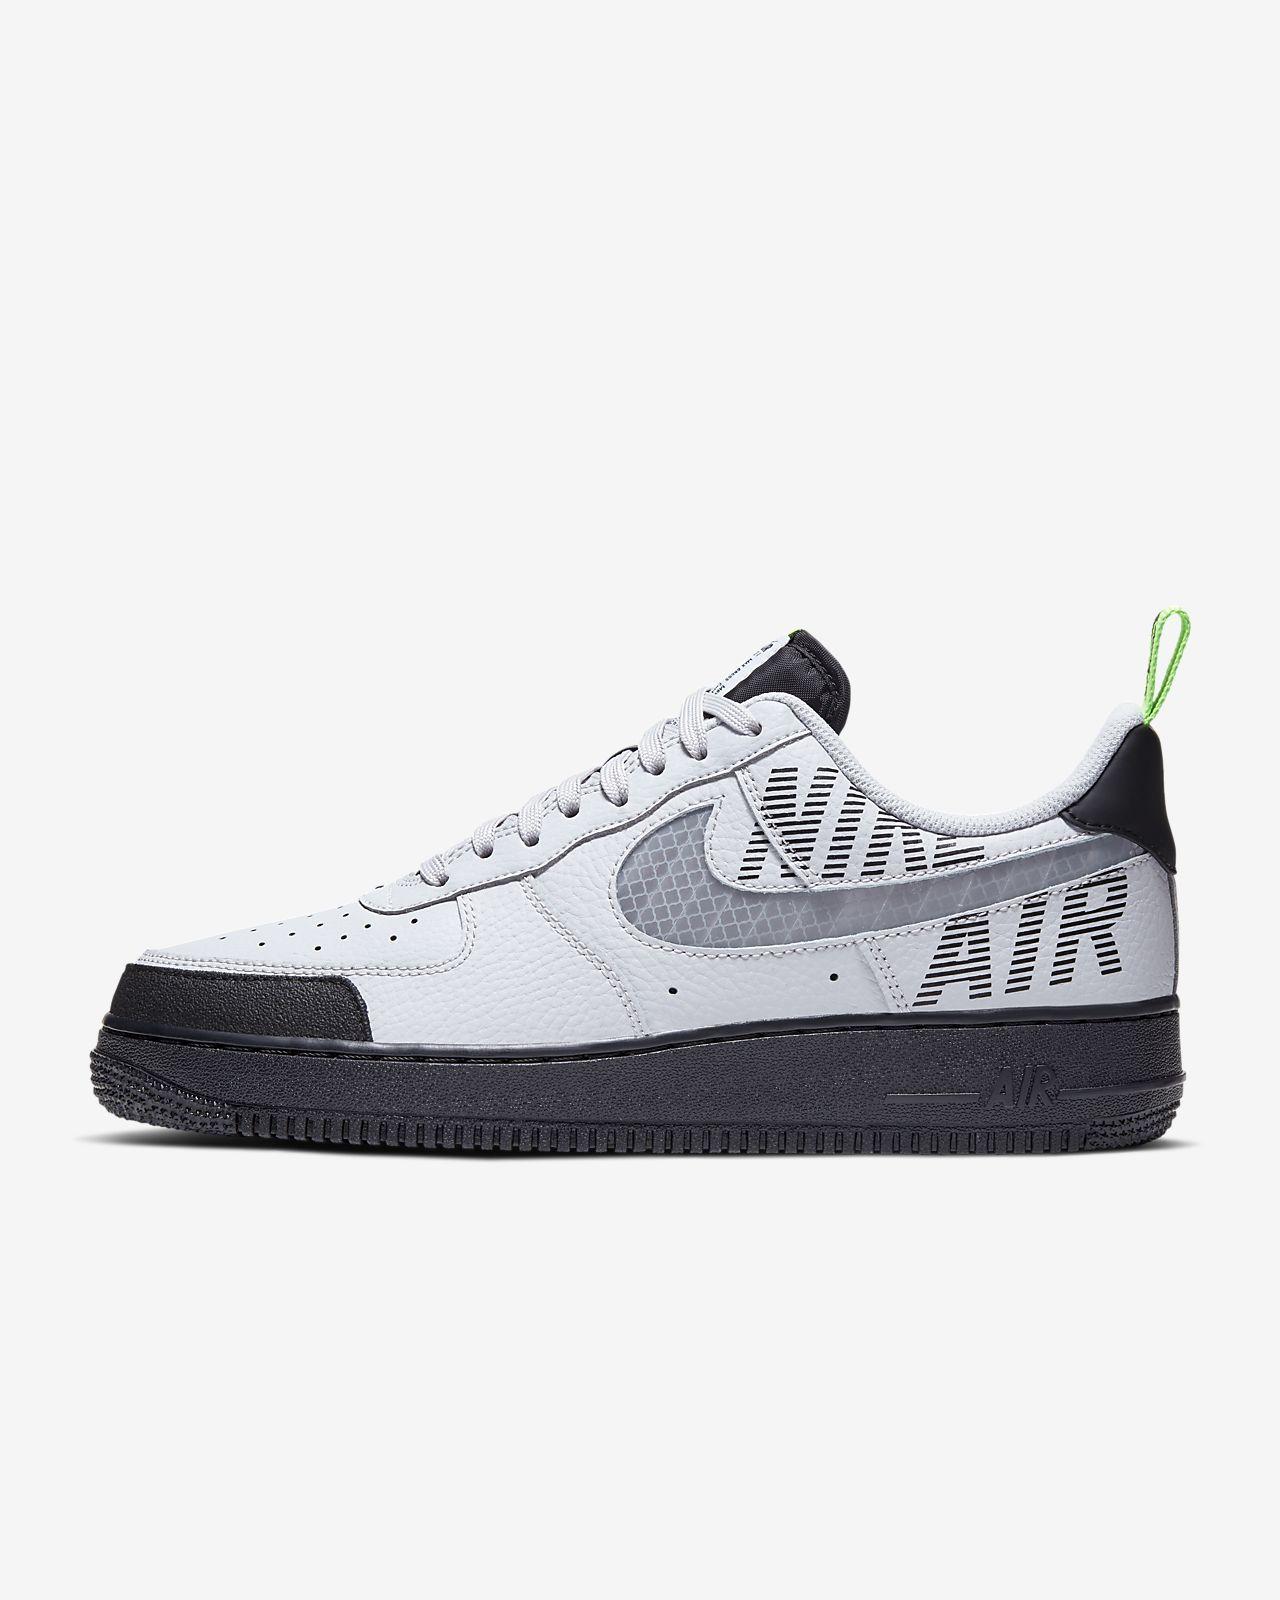 Nike Air Force 1 '07 LV8 Zapatillas - Hombre